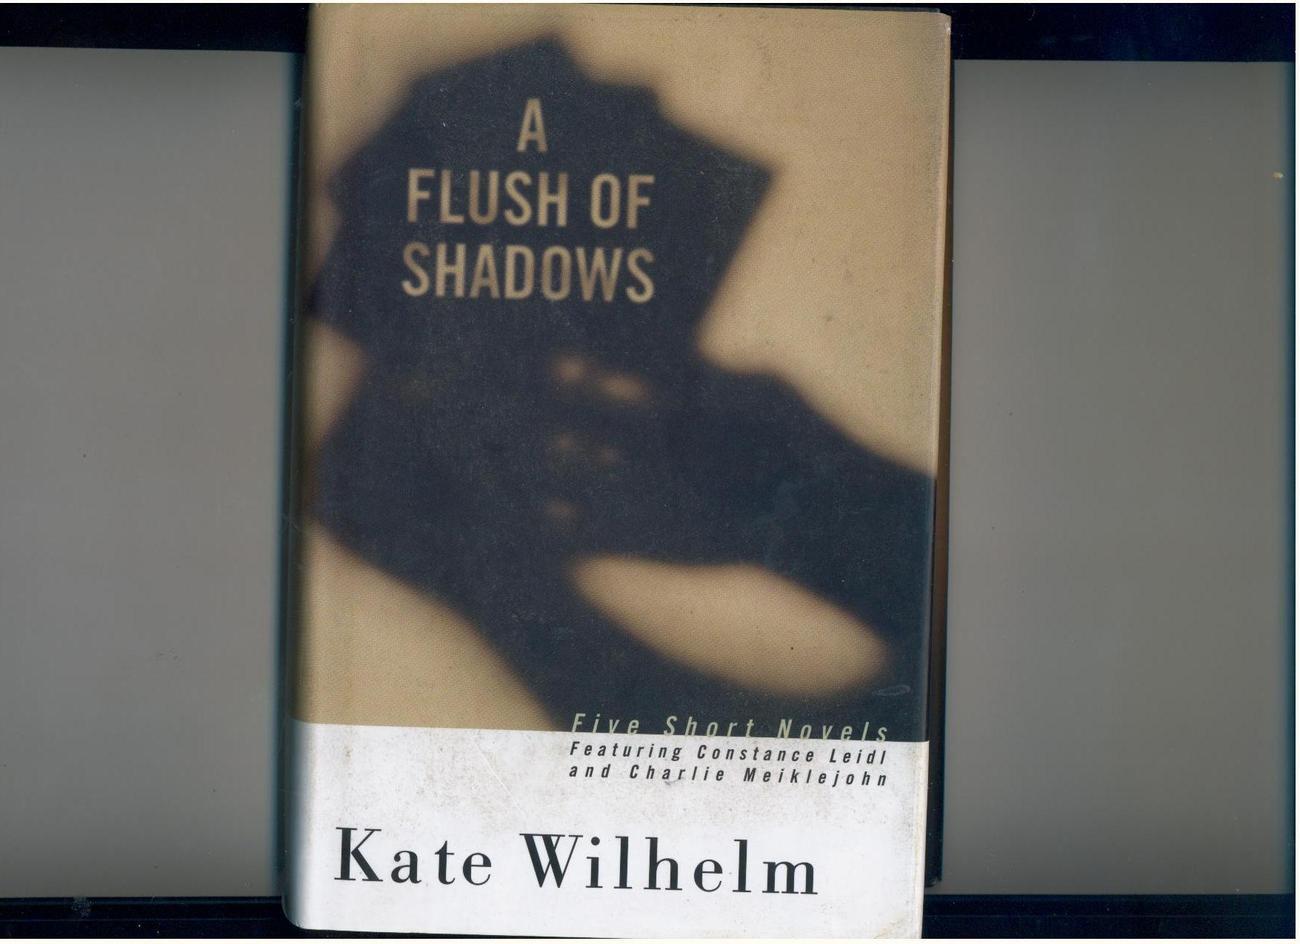 Kate Wilhelm - A FLUSH OF SHADOWS - 1995, 1st - 5 novellas